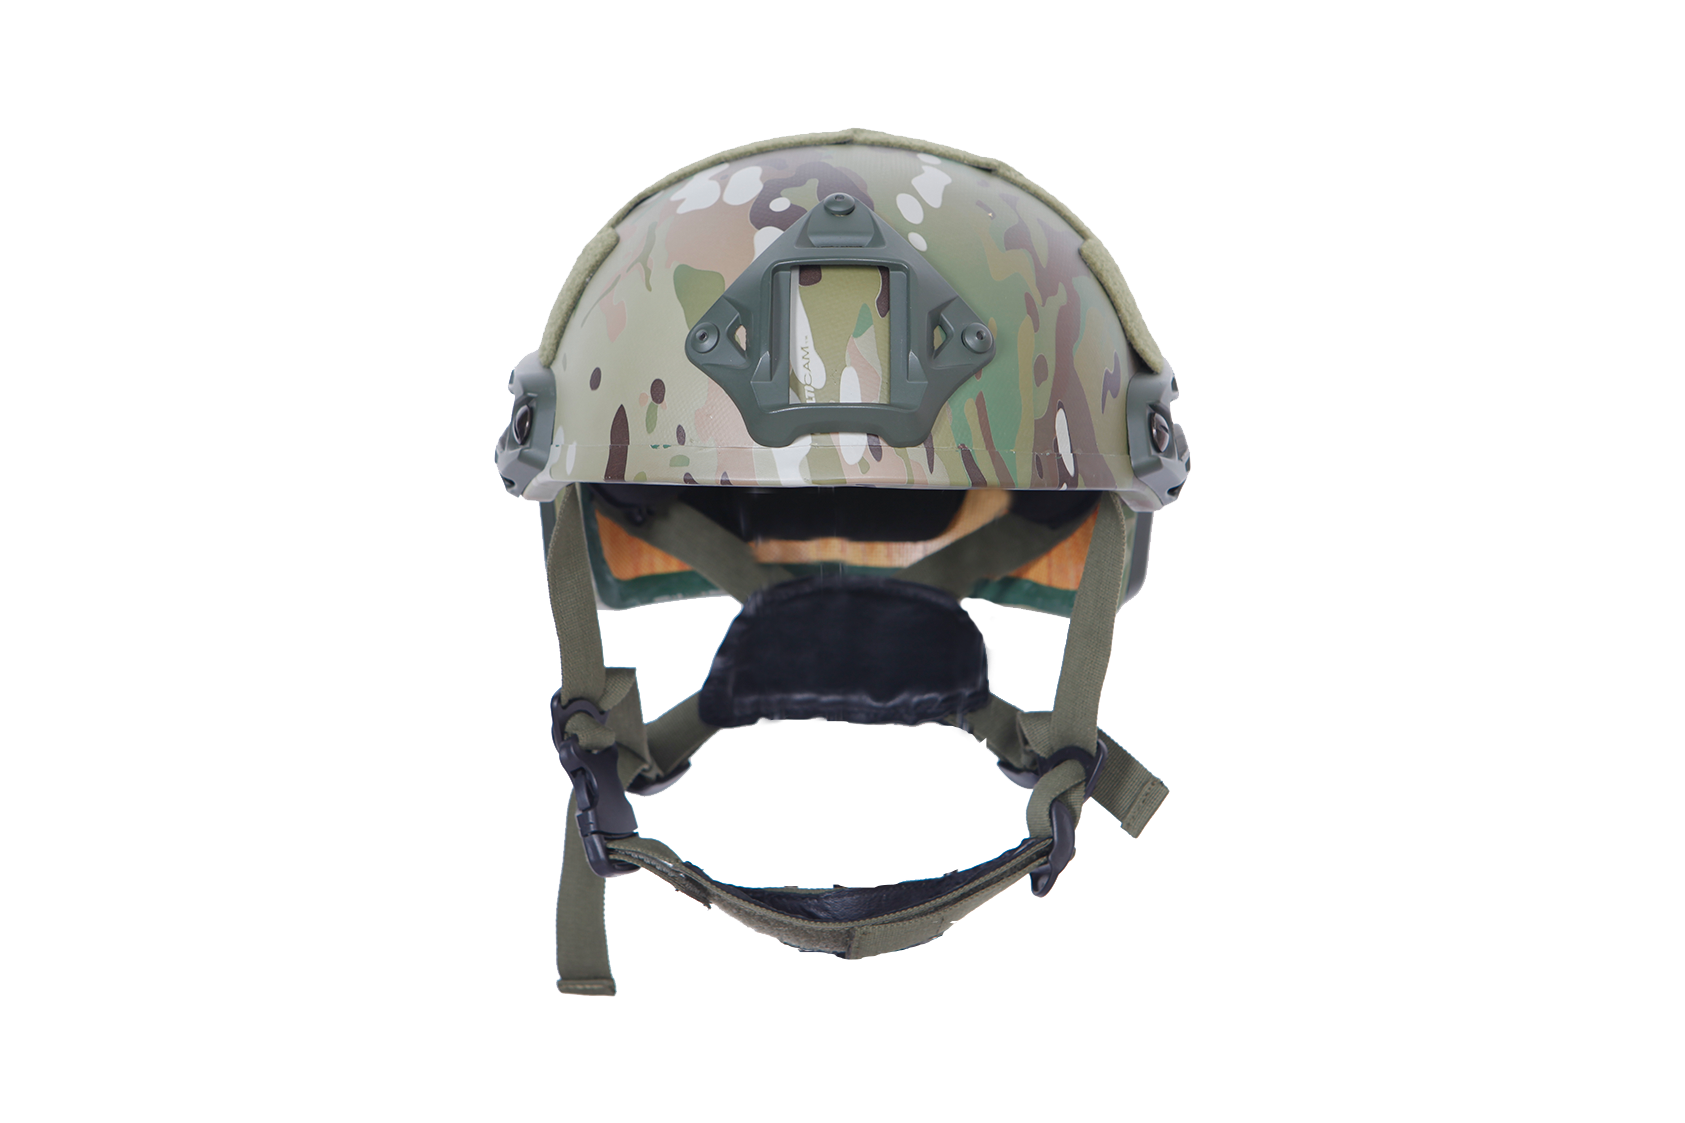 Fast Ballistic Helmet Kevlar Bulletproof Nij Lvl Iiia Painted Camouflage Color Camouflage Colors Camouflage Helmet